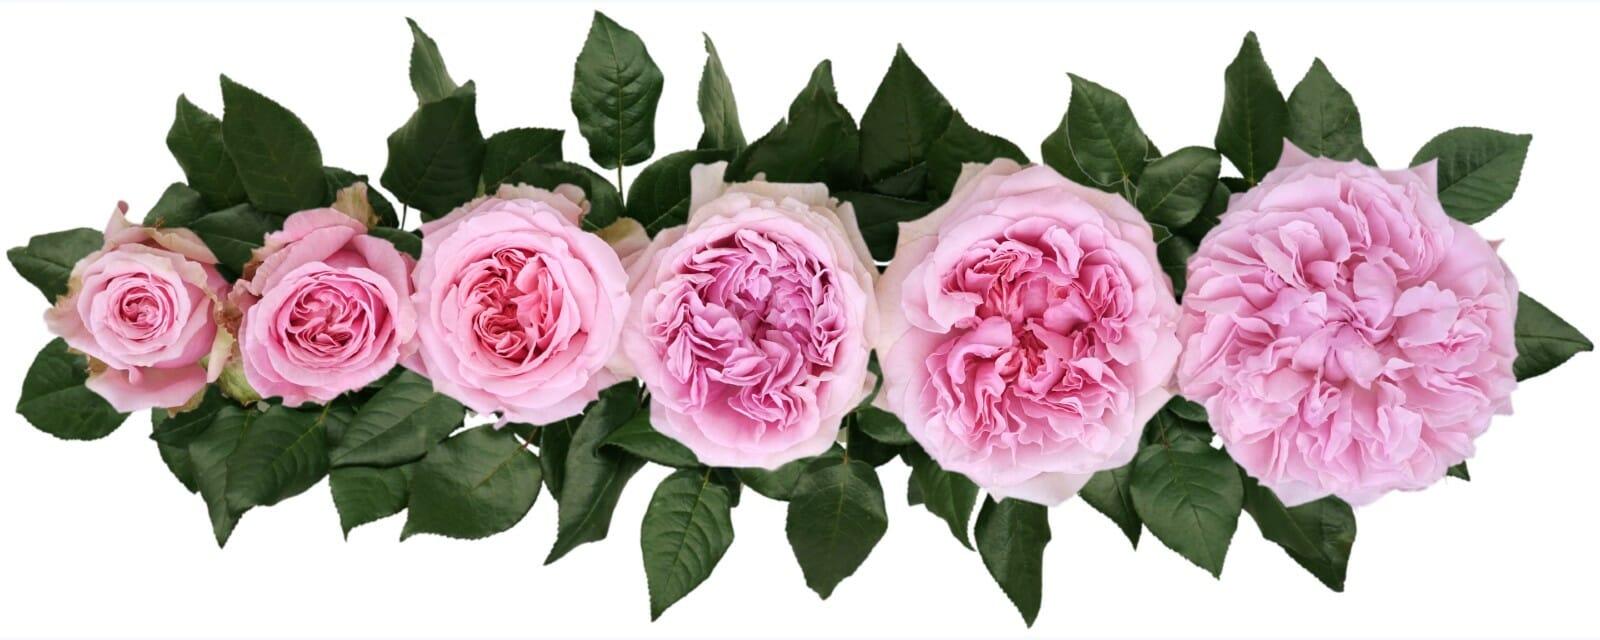 David Austin Miranda Wedding Rose Point of Cut